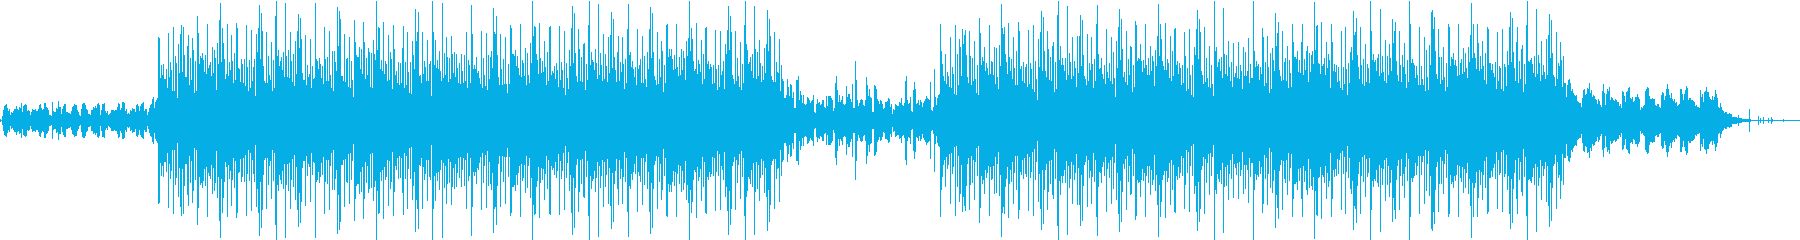 you777_chillout_r&bの再生済みの波形